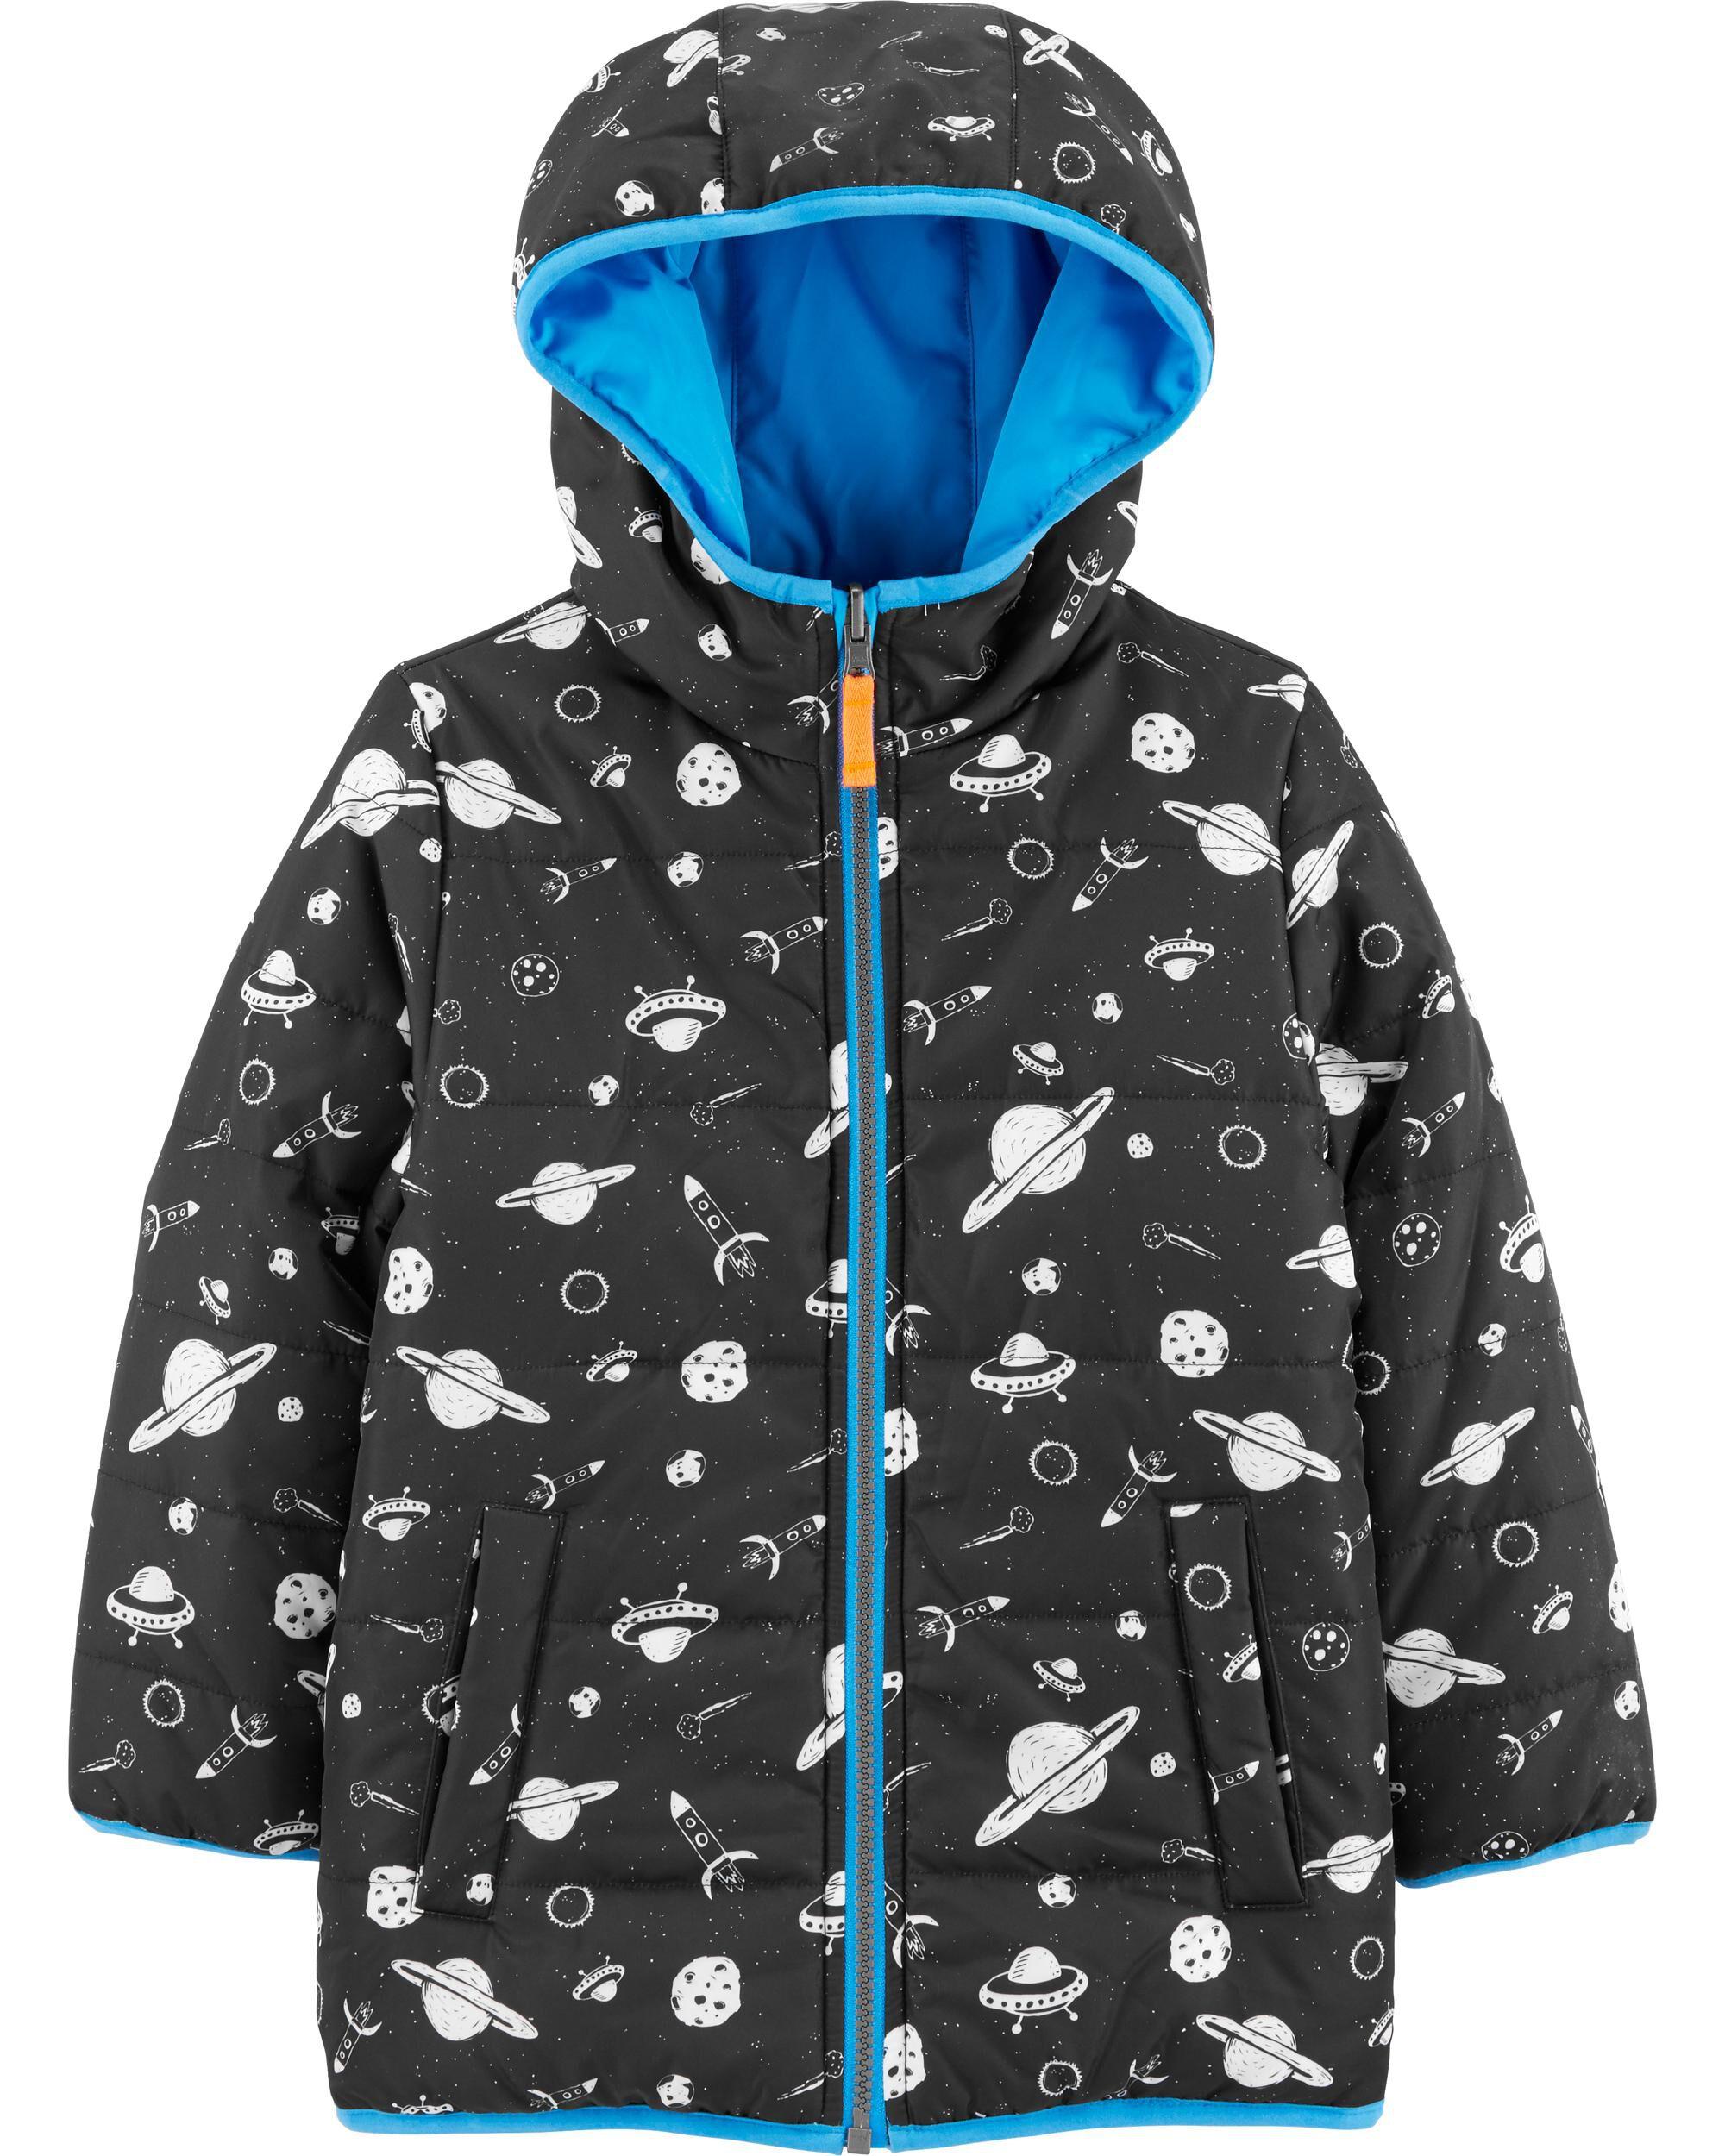 Carters Boys Reversible Bubble Jacket